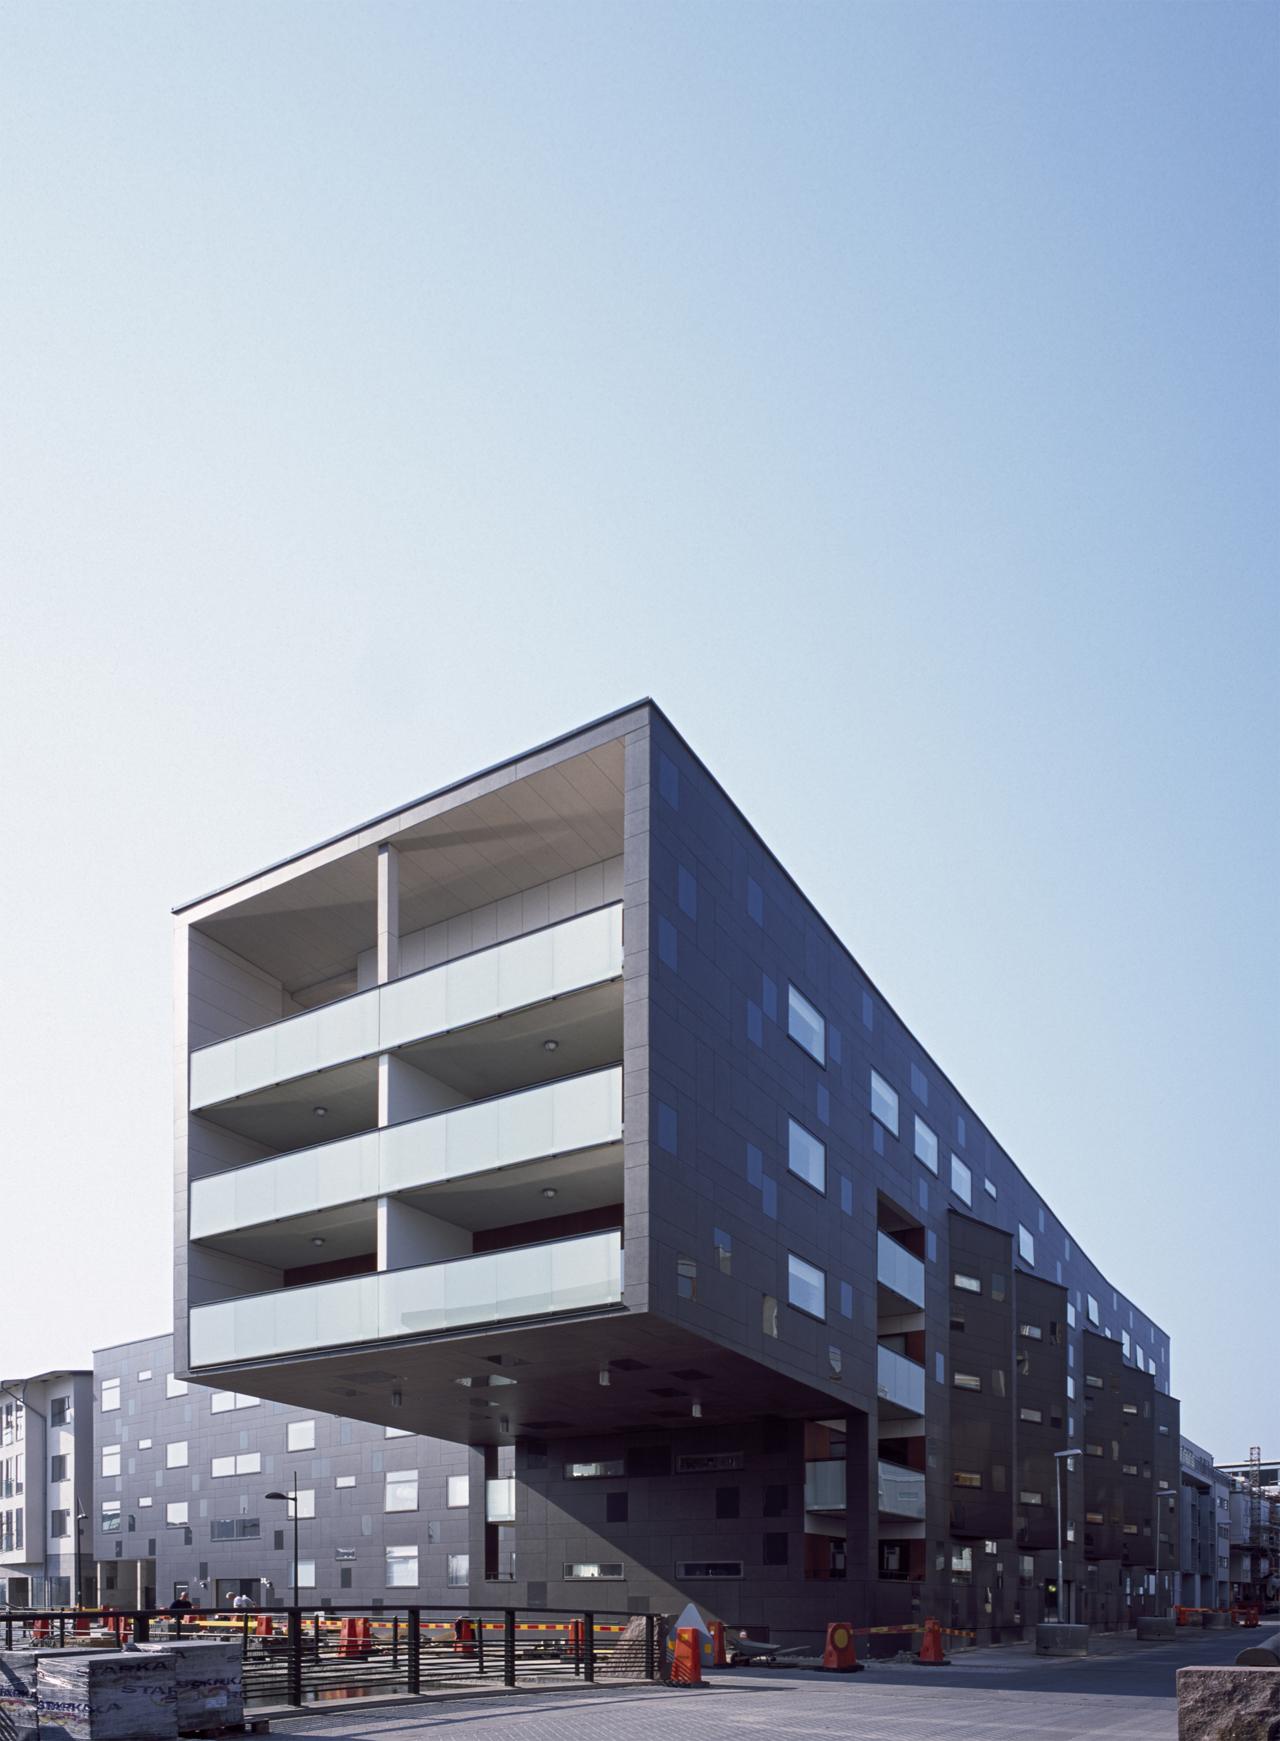 Hytten 4 / Metro Architects, © Rafael Palomo